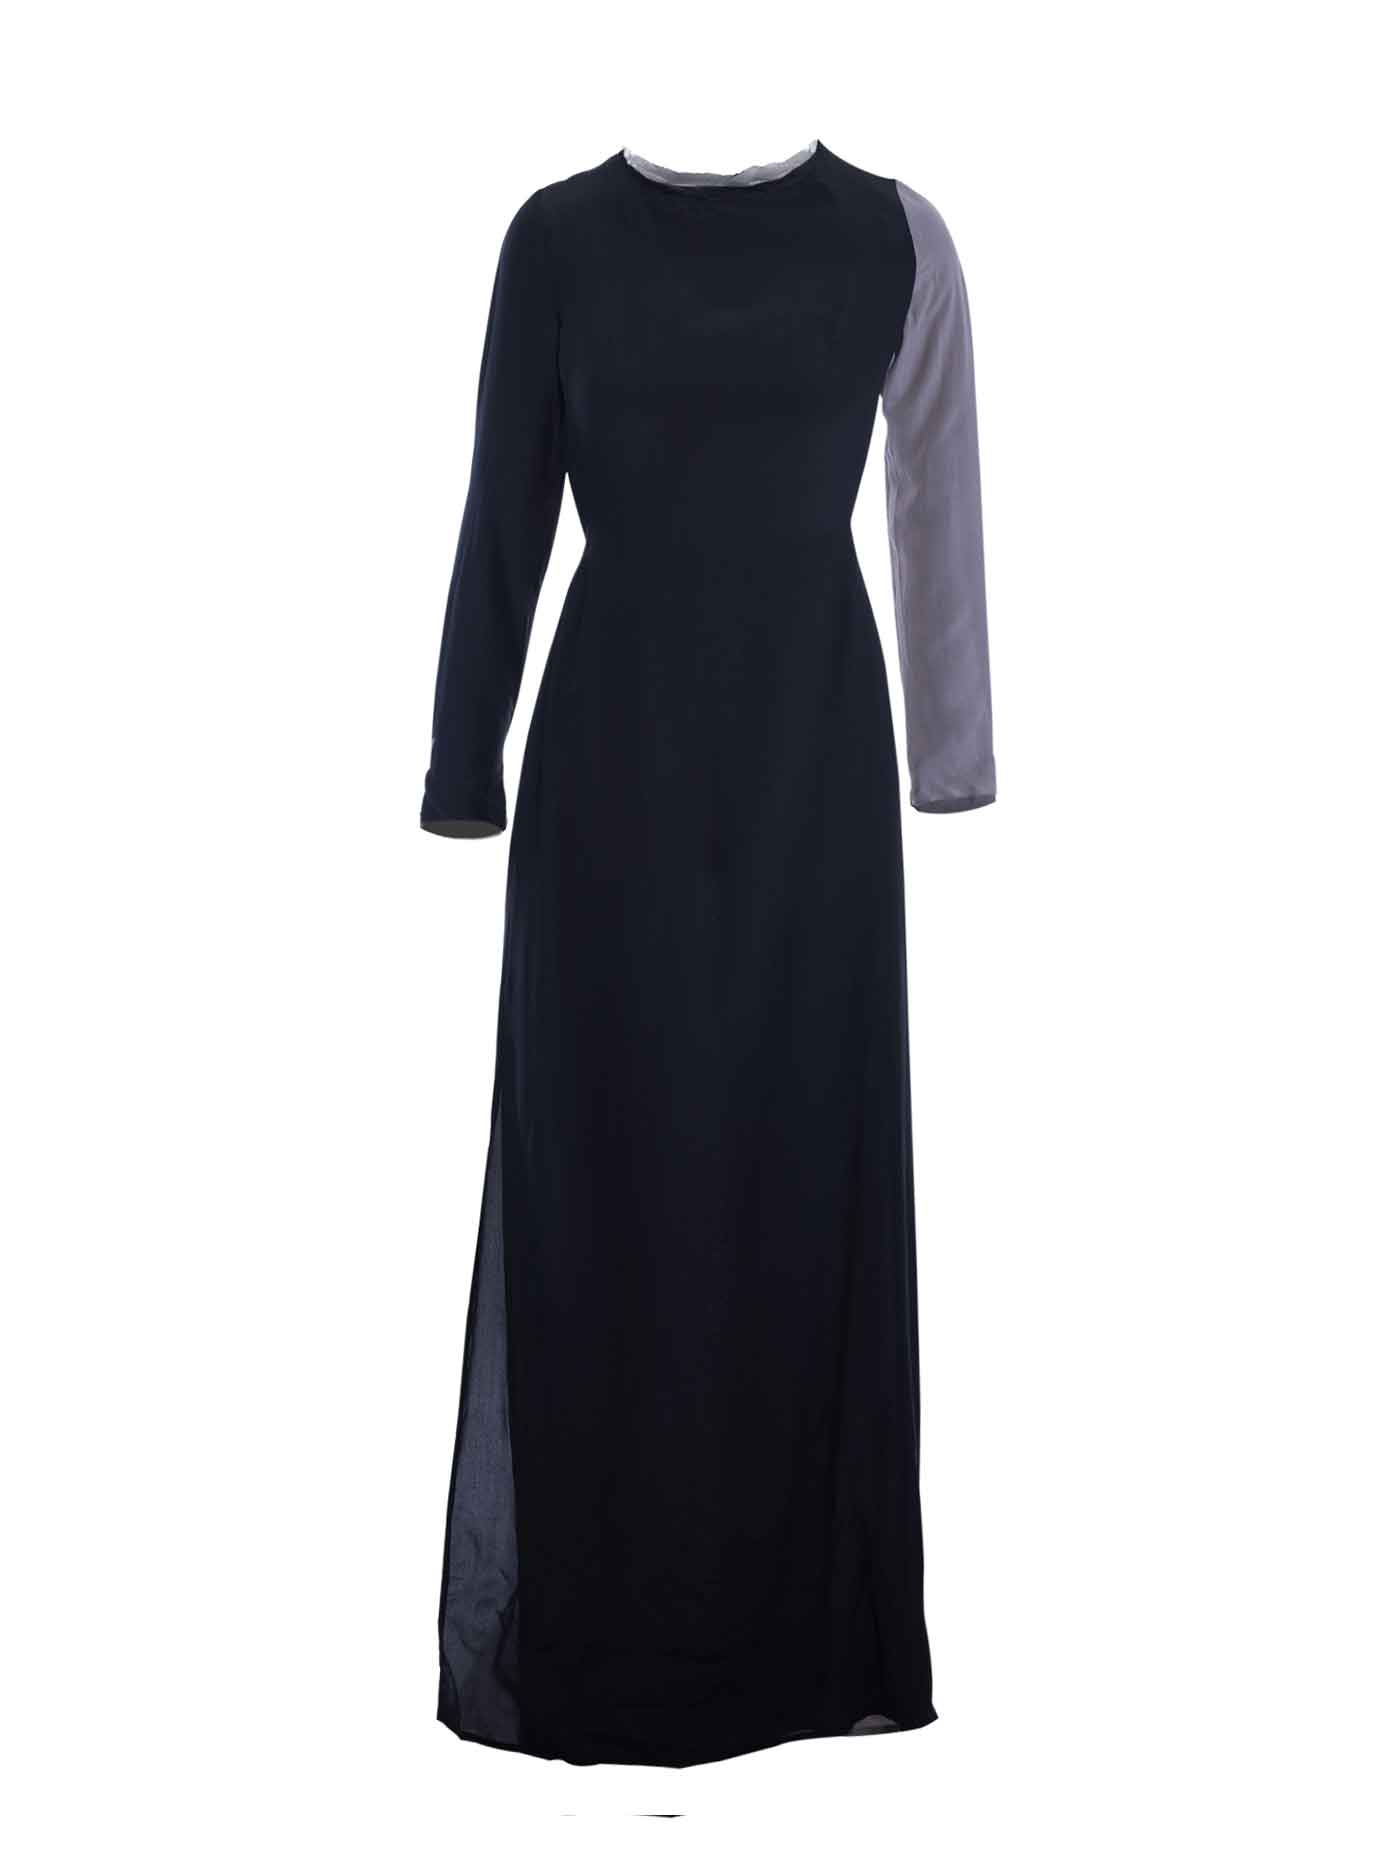 b31bf1c10ddc7 Winter Kate Color Block Long Silk Dress - fEROSh